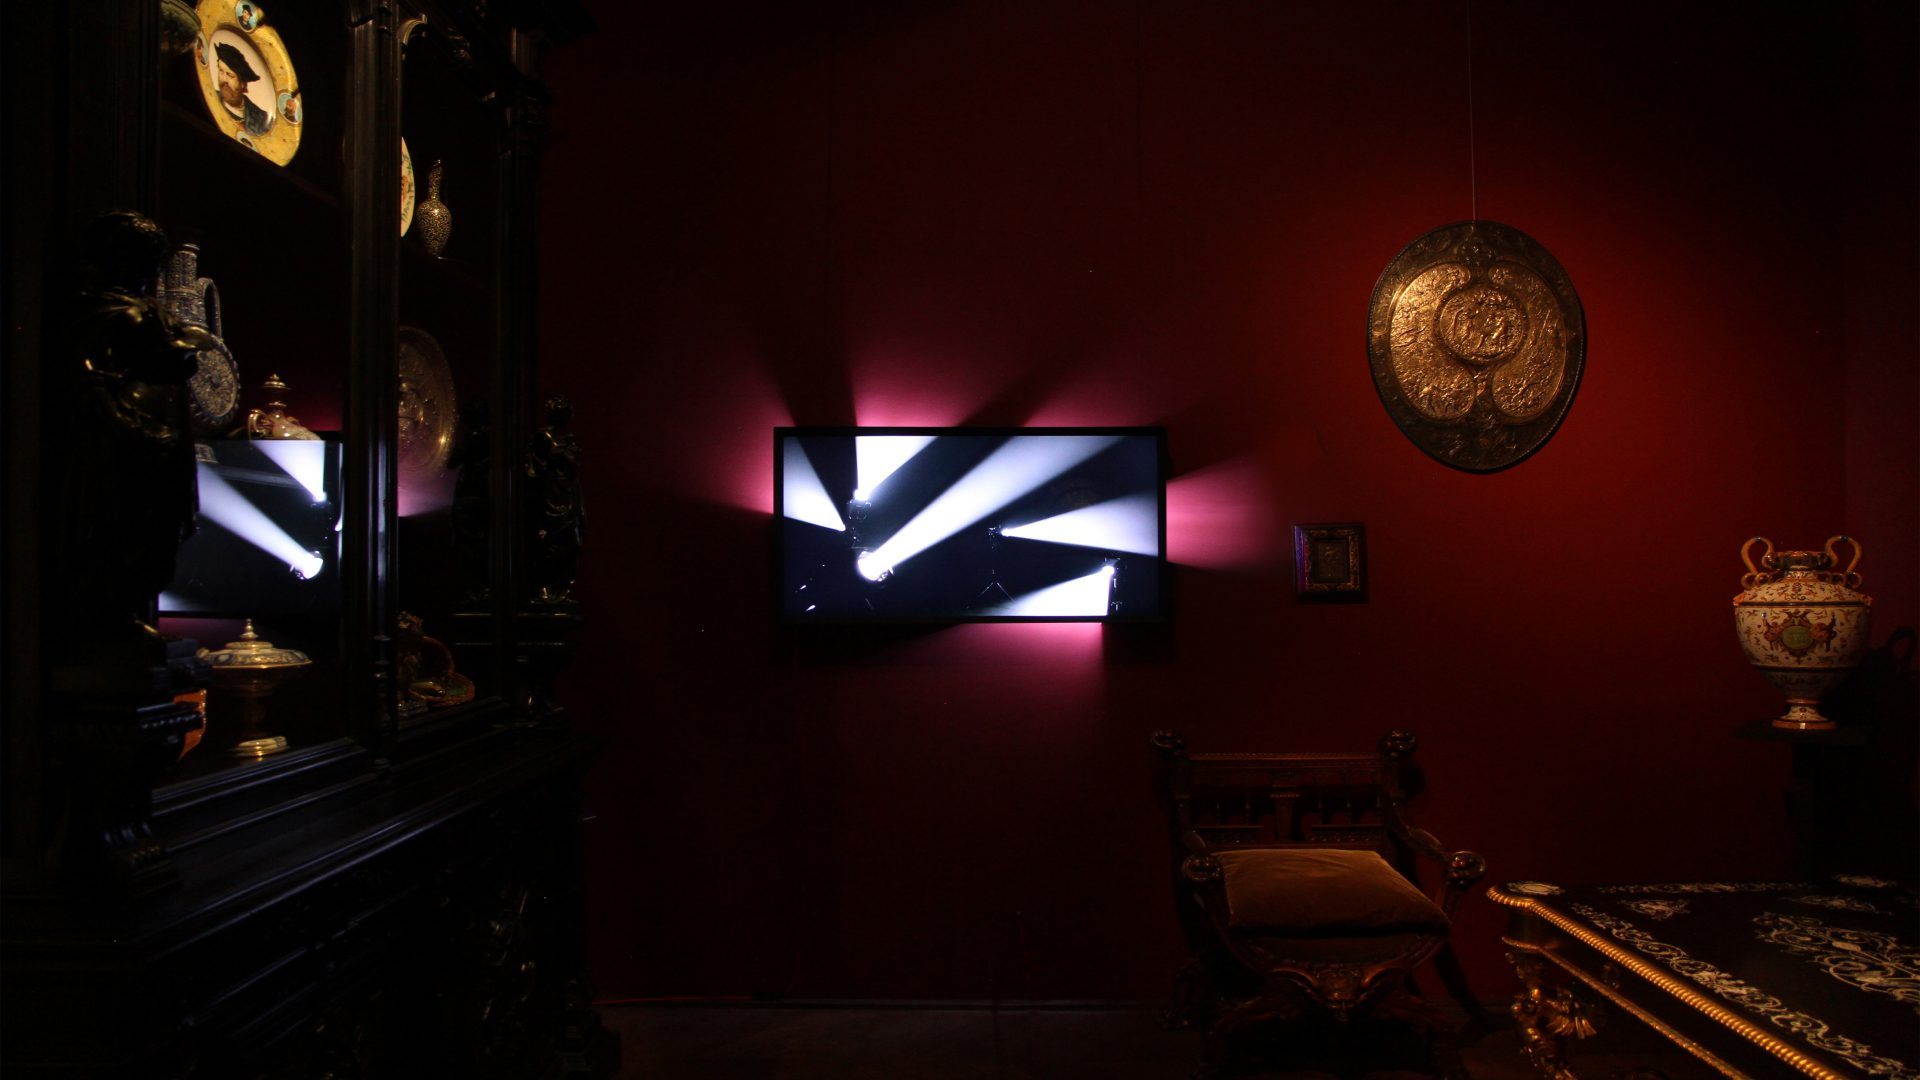 L'image éclaire - Light beams screen - Arts decoratifs Museum of Paris, 2016 / Credits : RF Studio